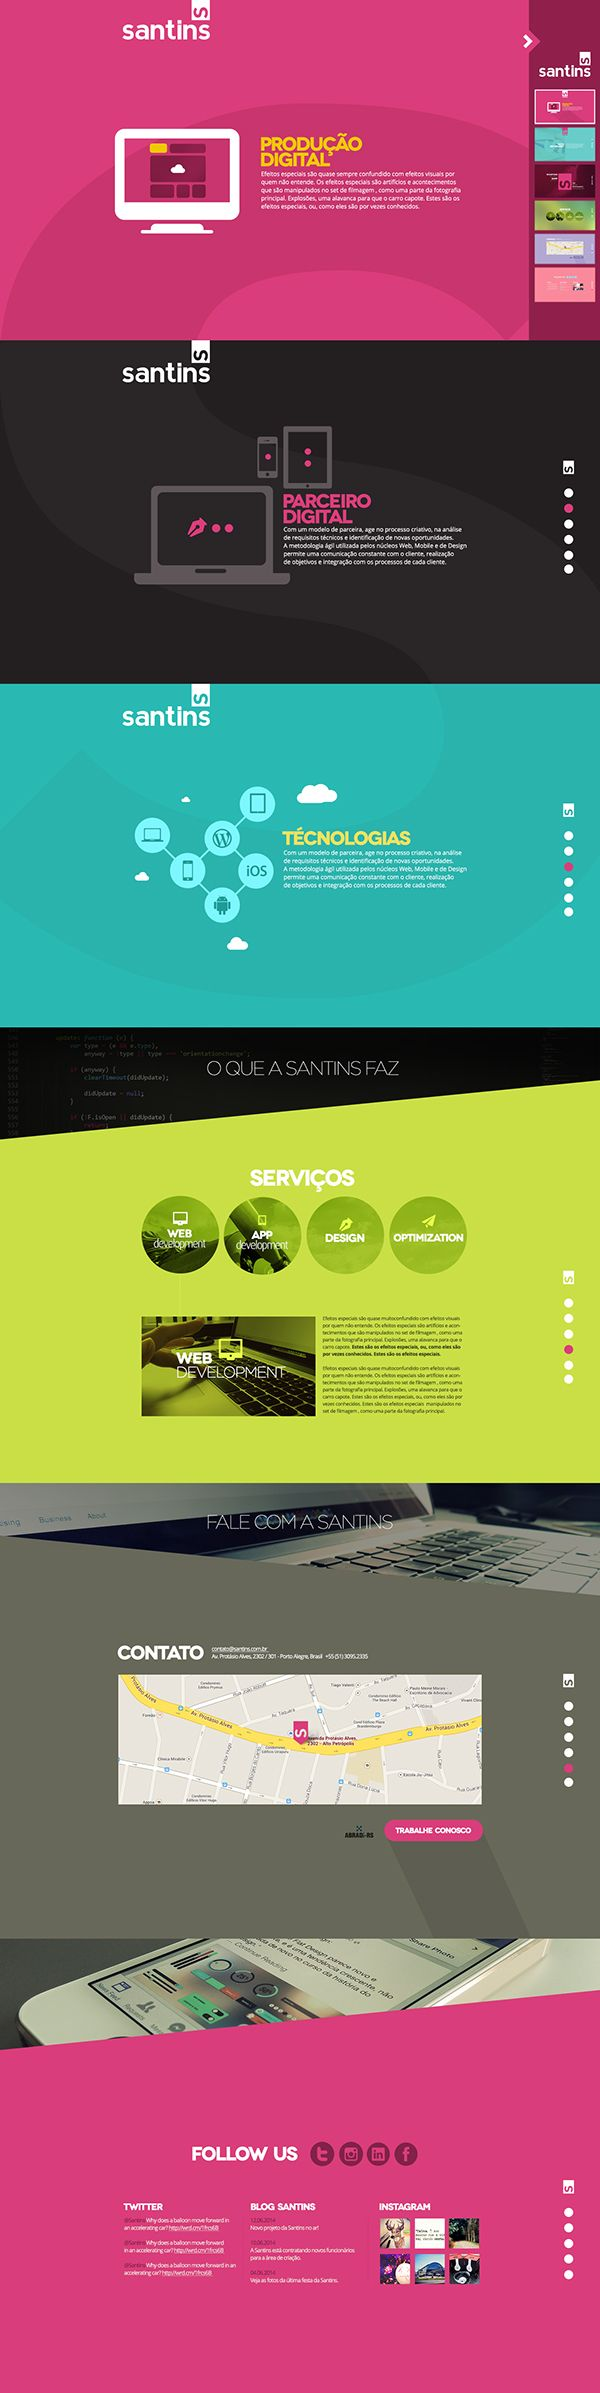 Cafe Mobile App How Will It Help Me Web Design Web Layout Design Web Design Inspiration